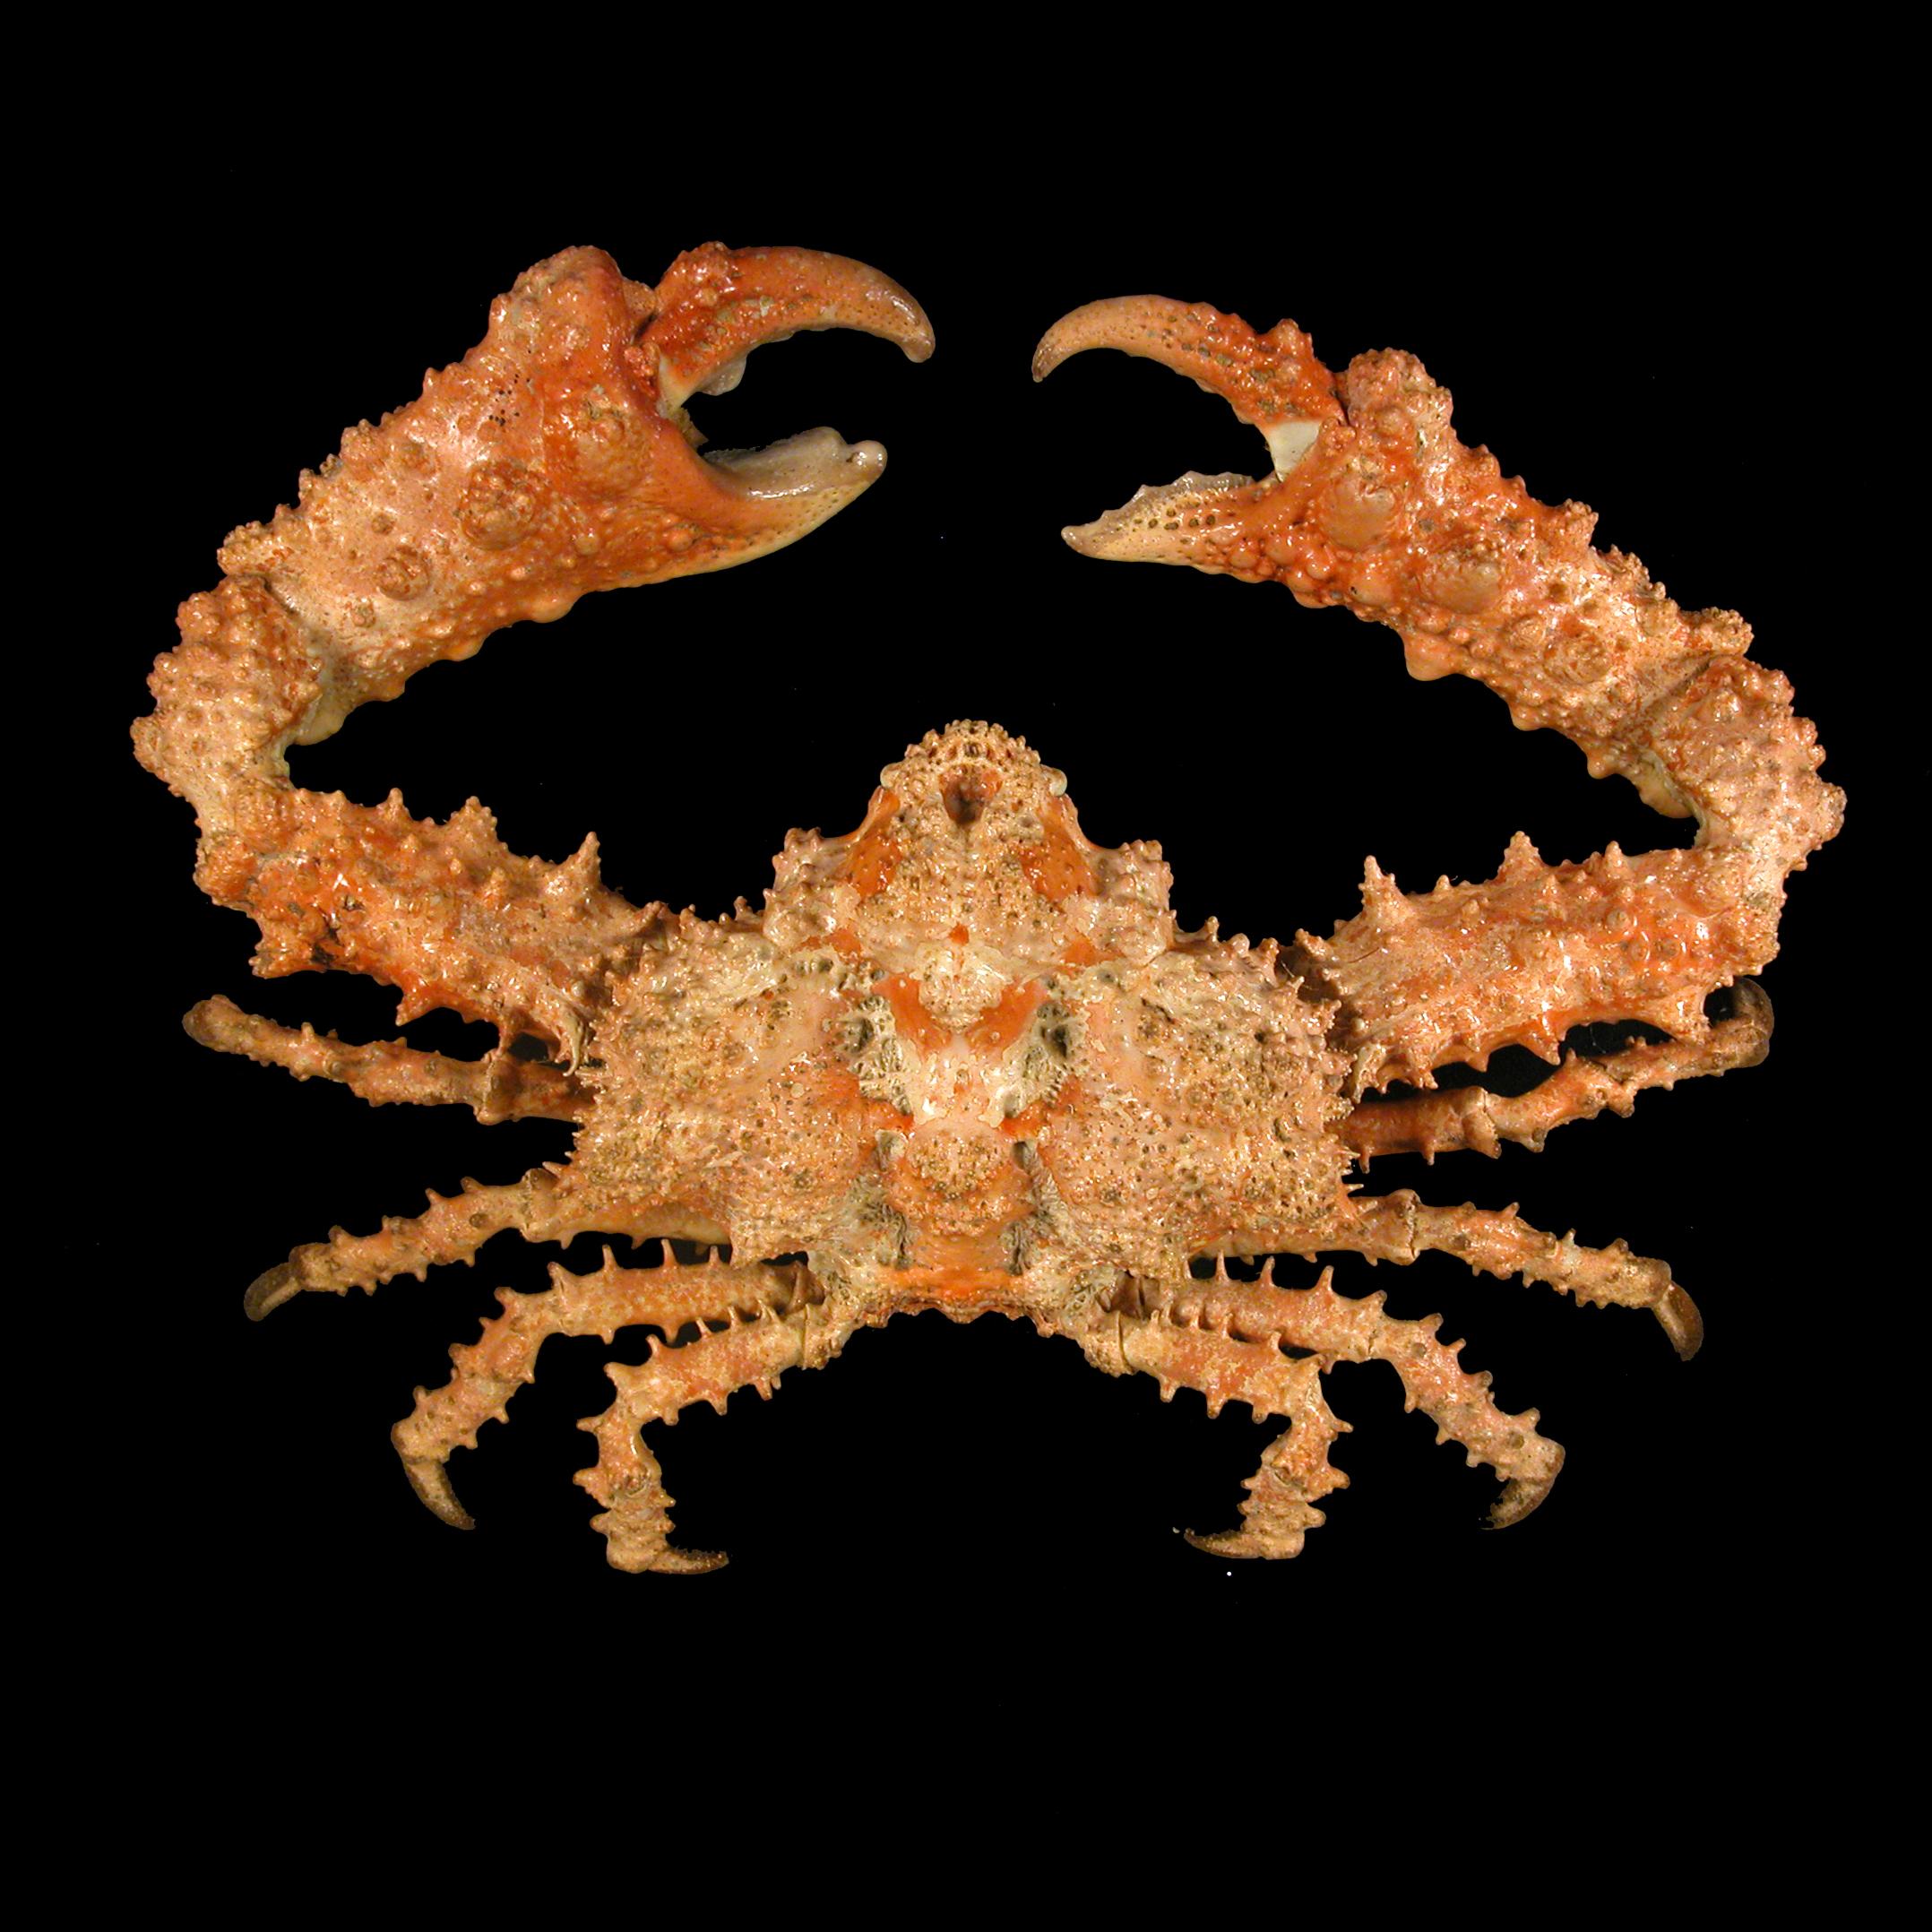 Parthenopidae